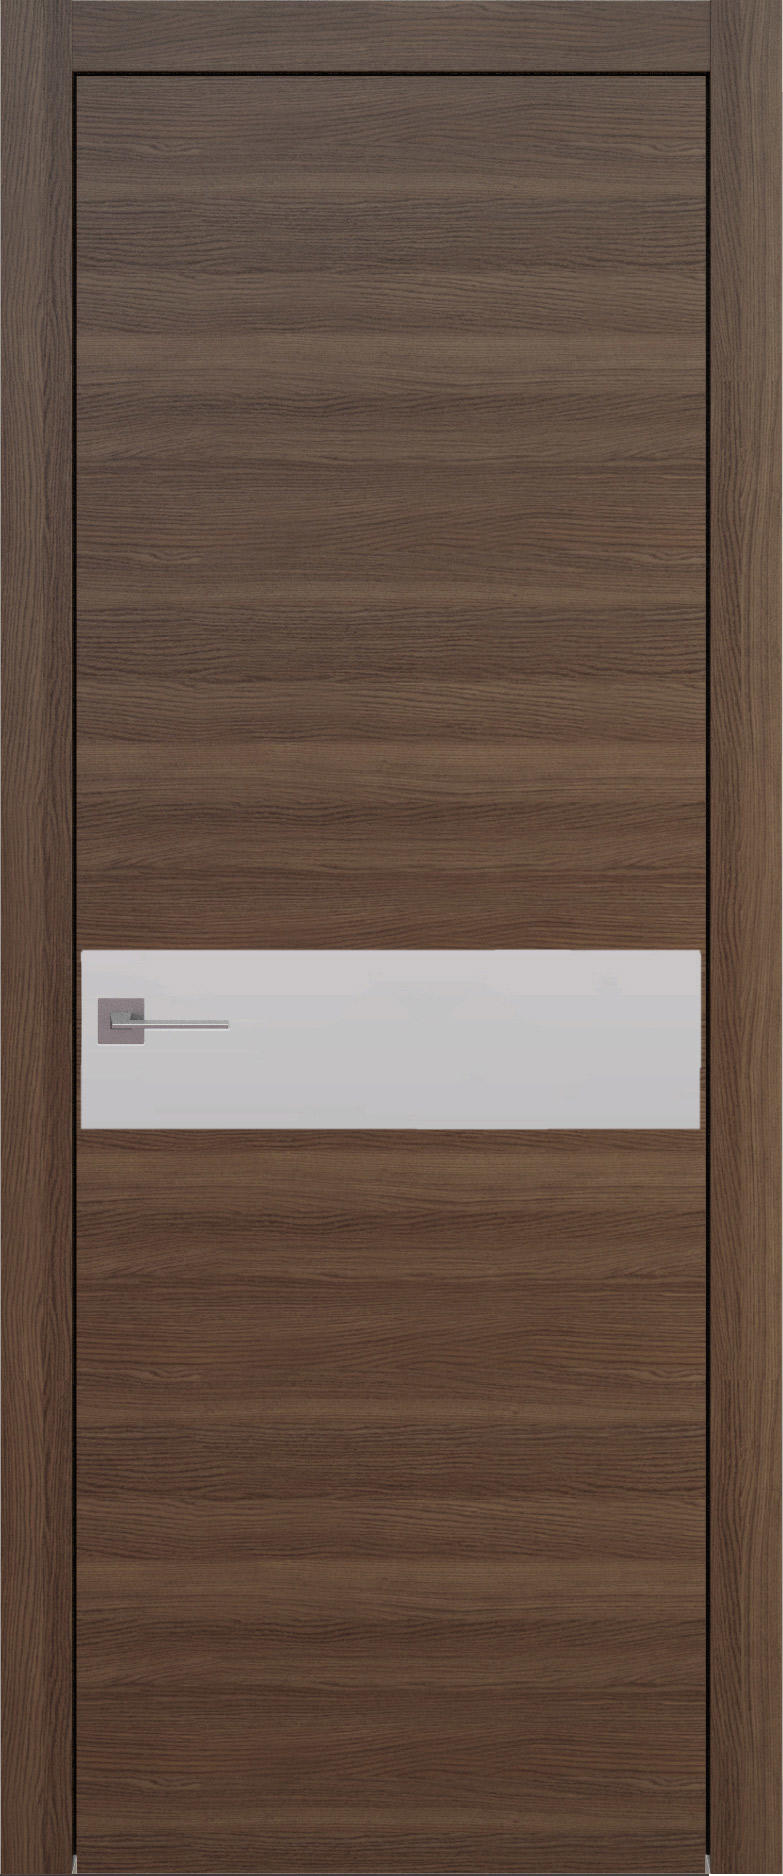 Tivoli И-4 цвет - Дуб торонто Без стекла (ДГ)